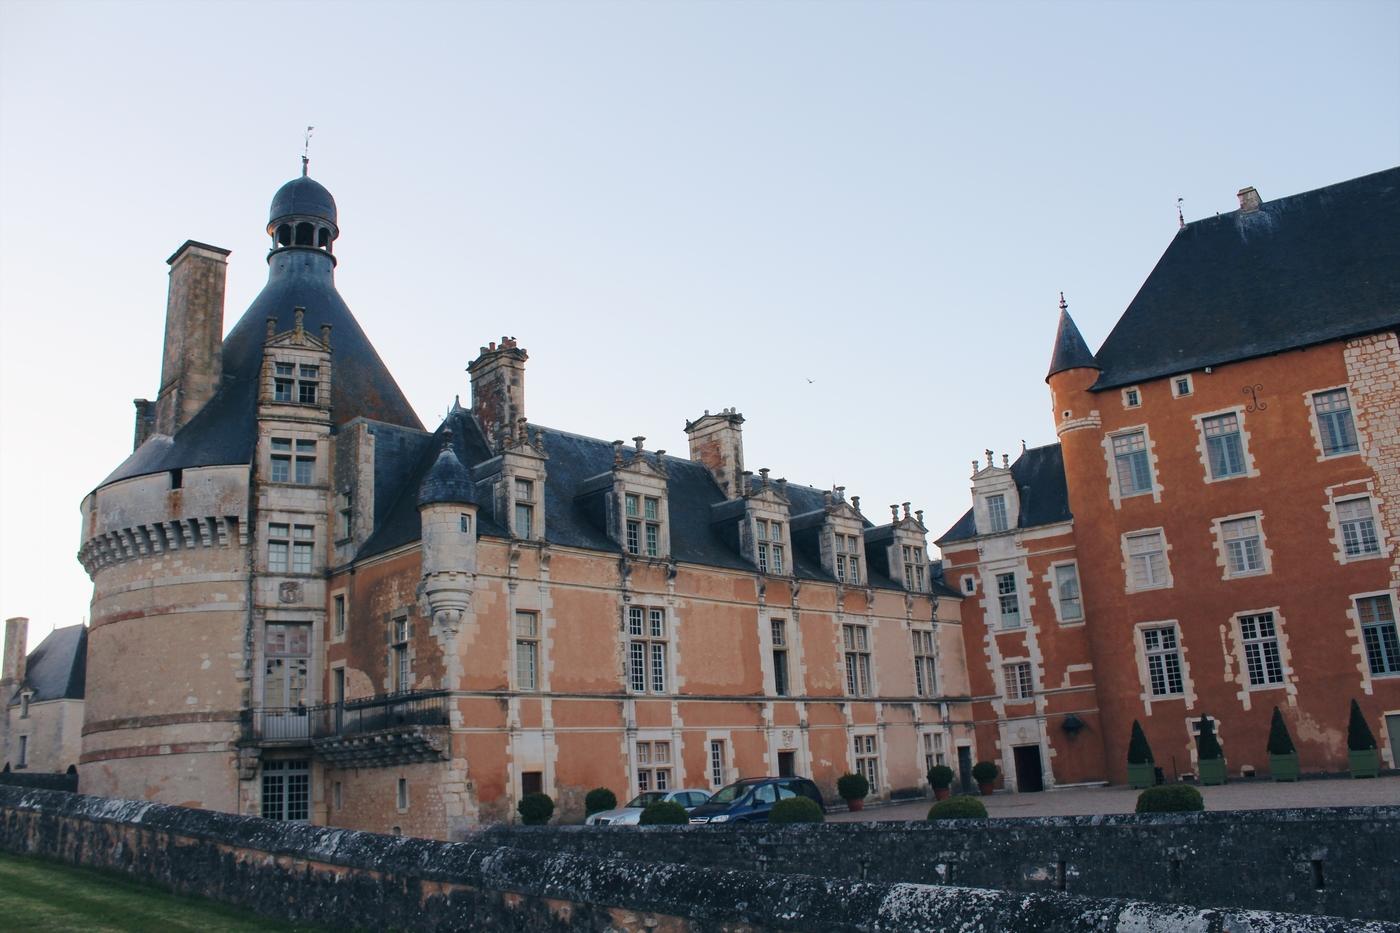 chateau de touffou 7.jpg